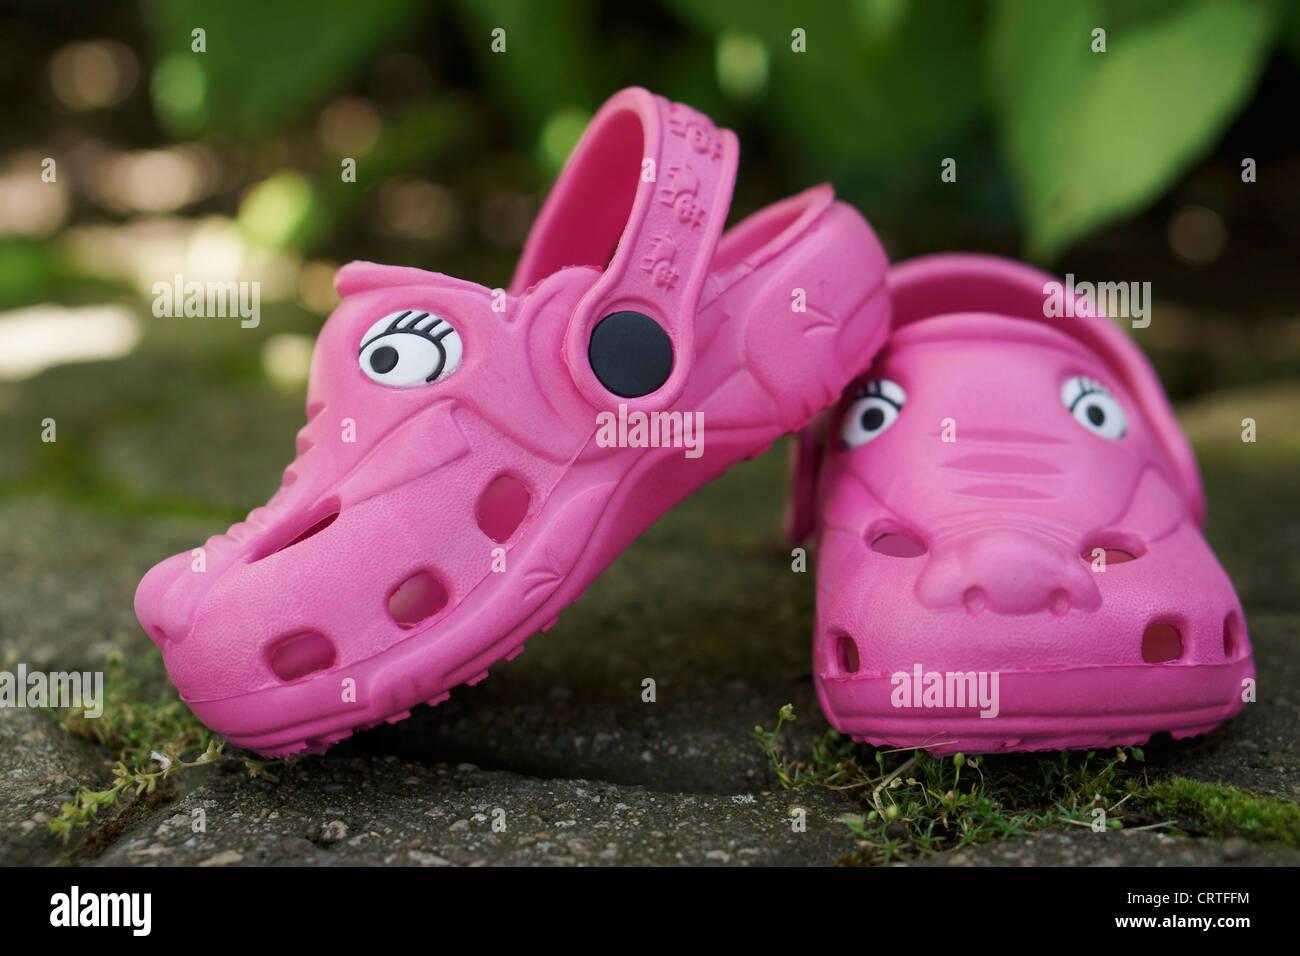 Pink Plastic Clogs - Stock Image